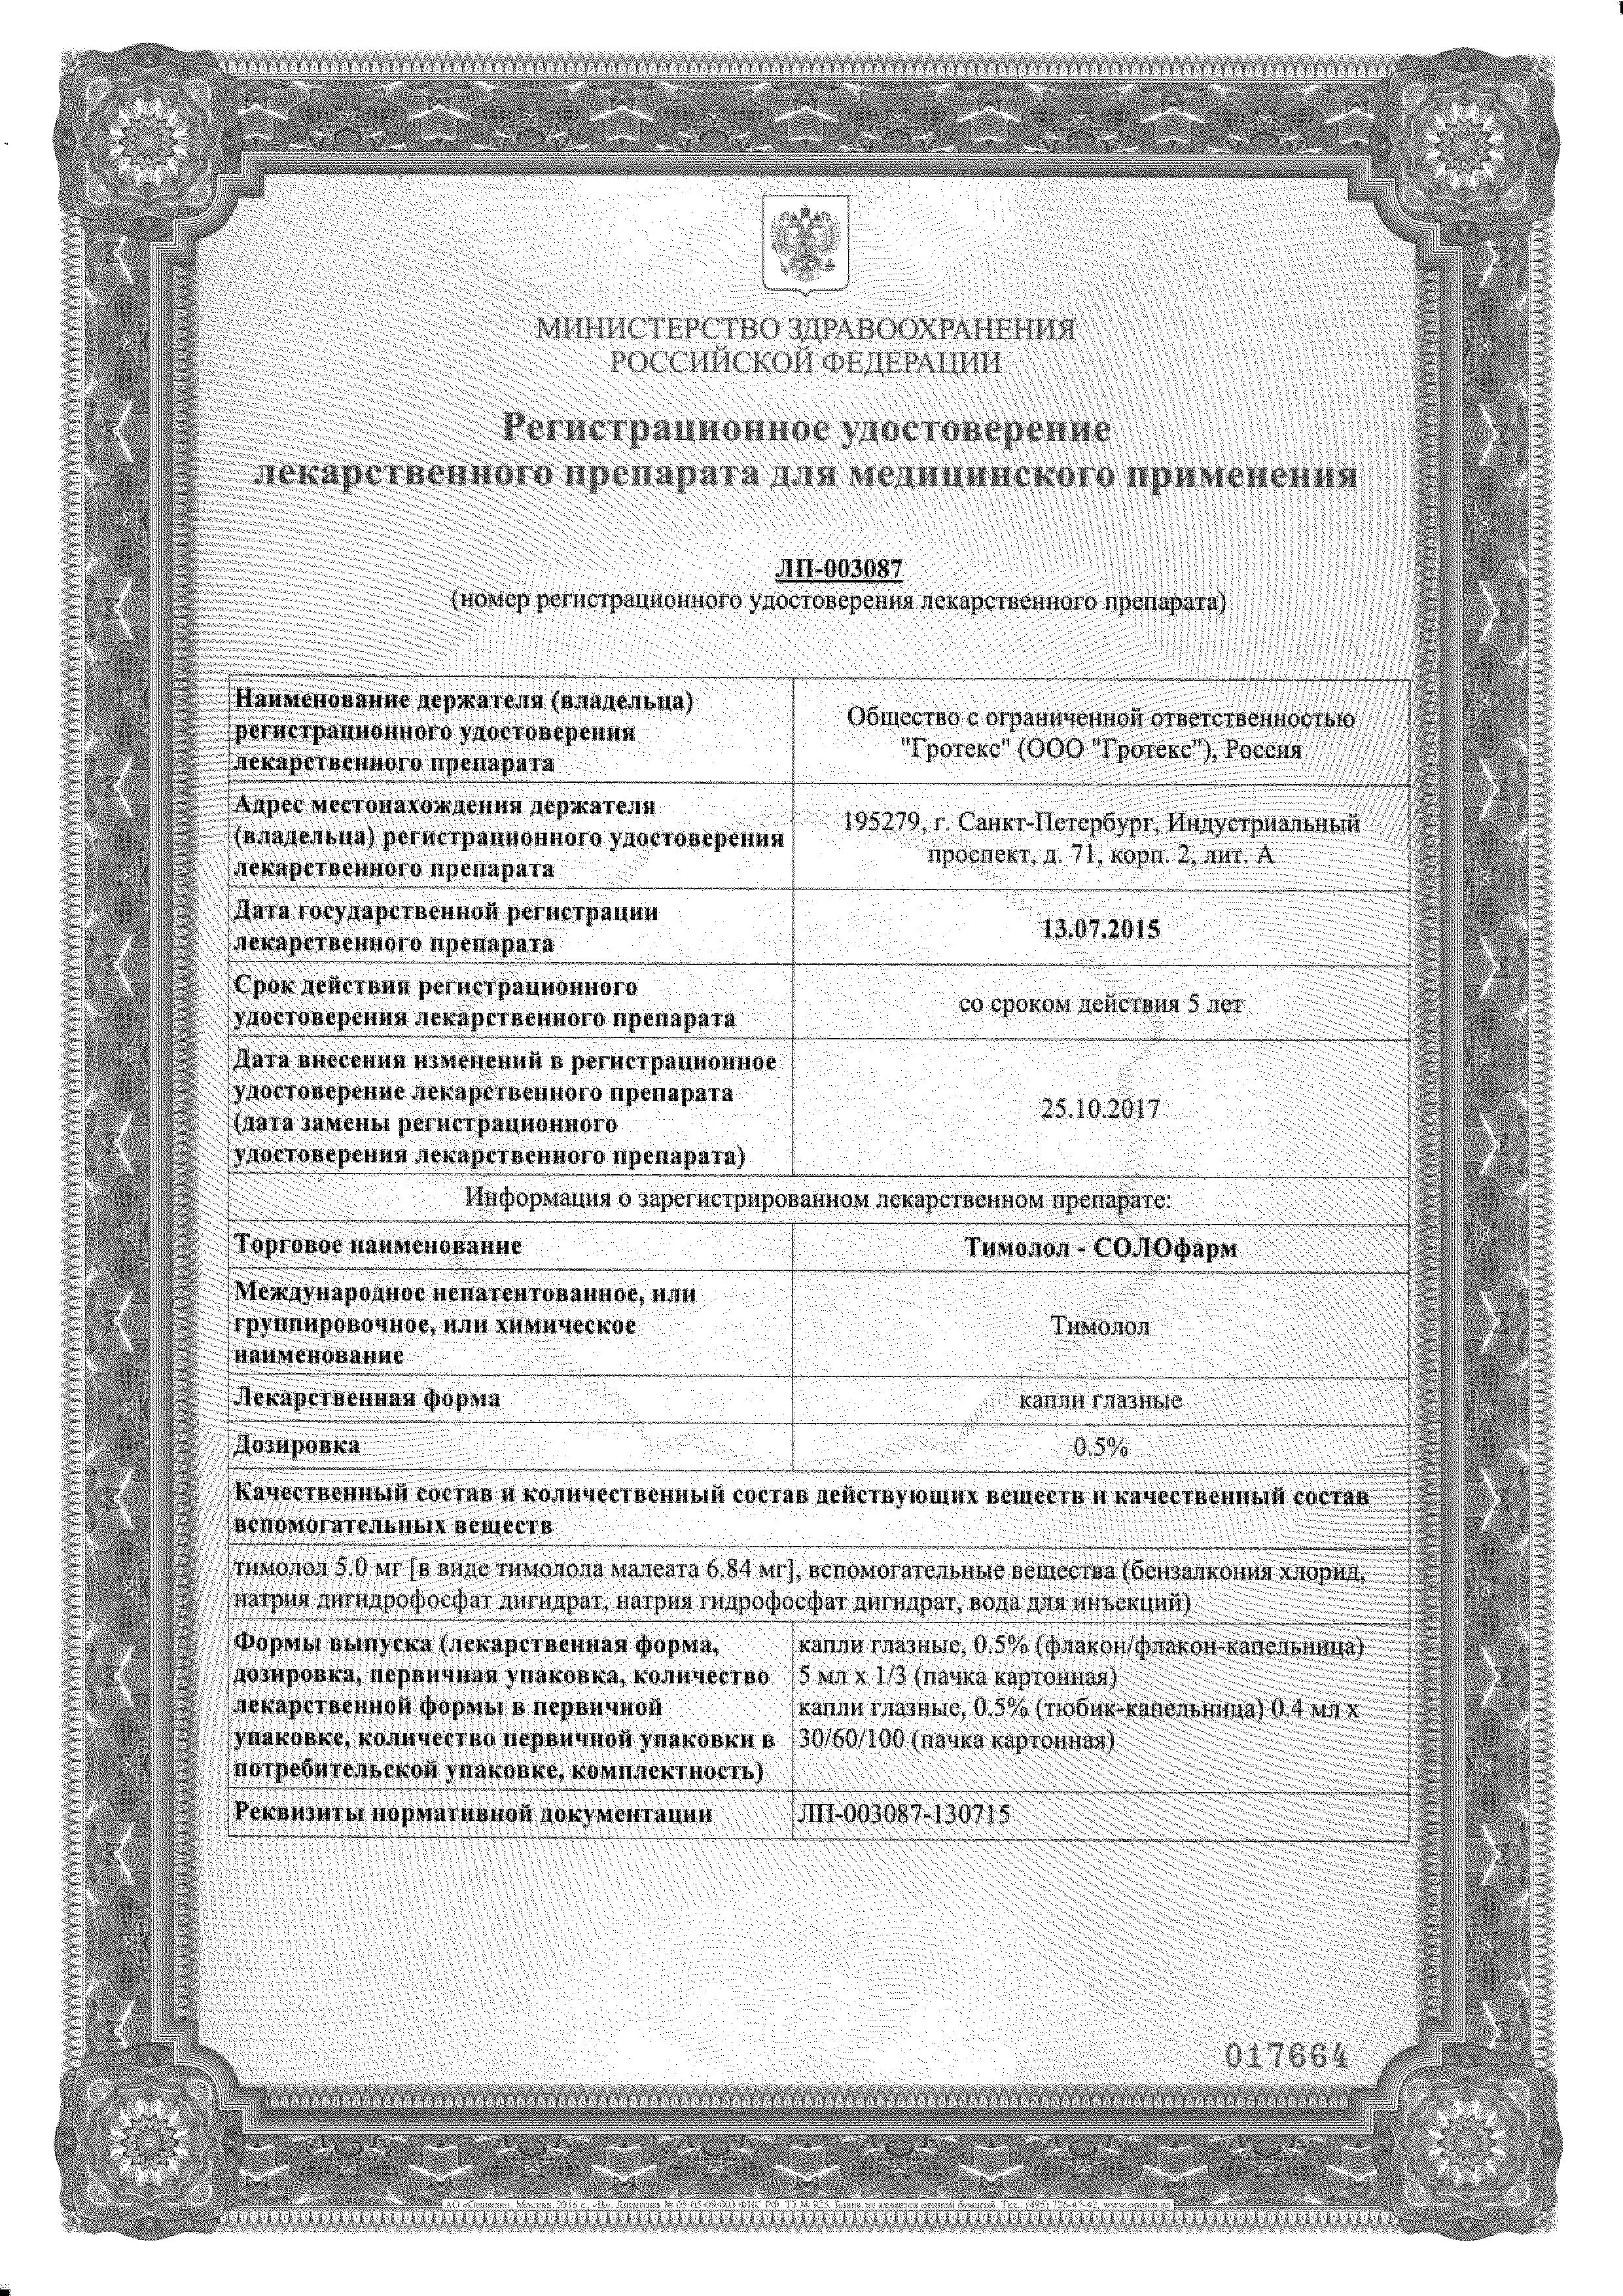 Тимолол сертификат